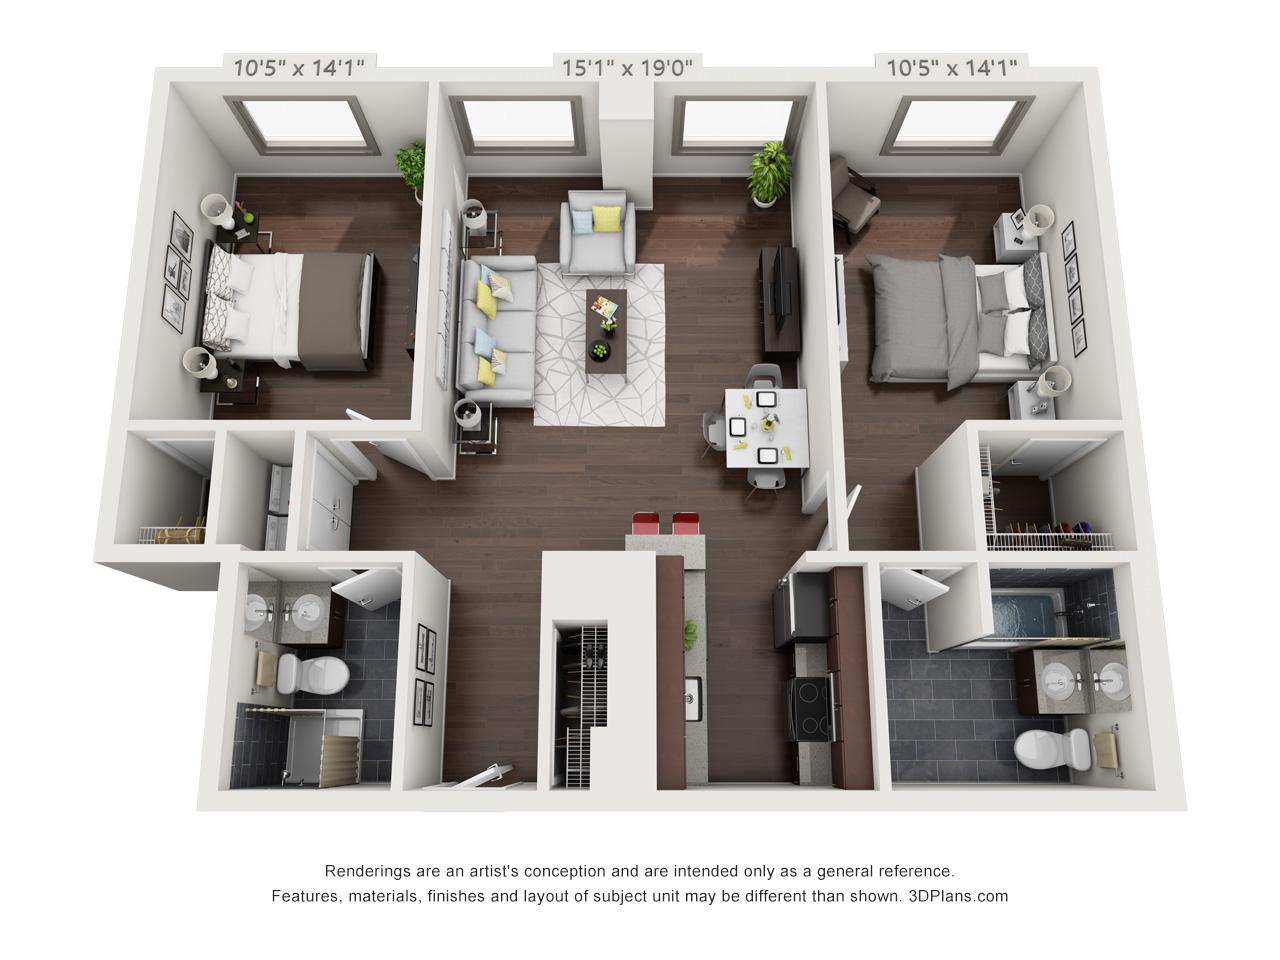 spring garden apartments in philadelphia - 2 bedroom